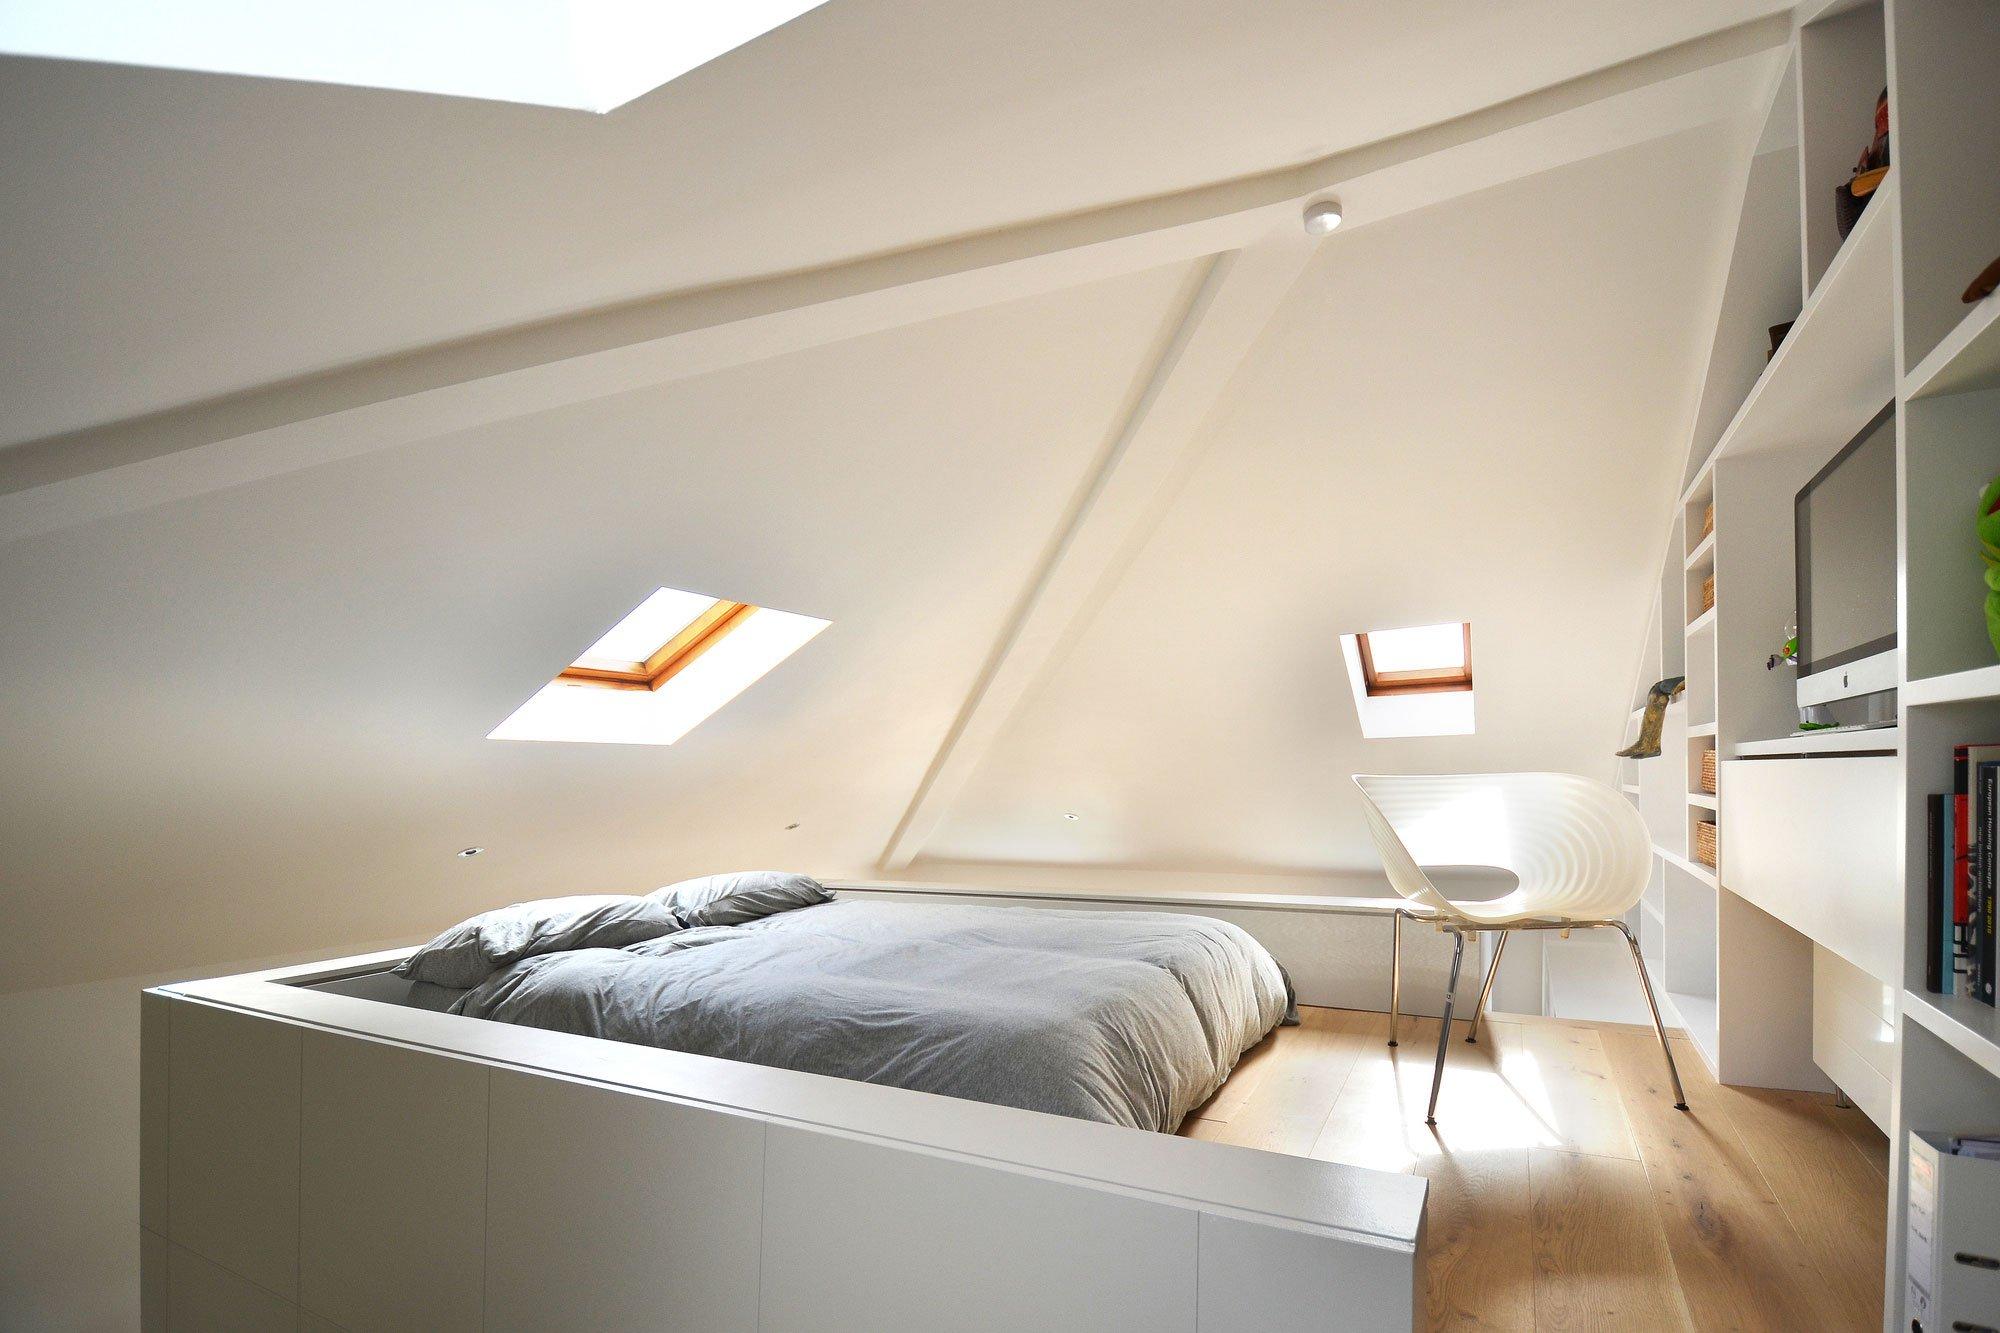 loft-space-in-camden-12